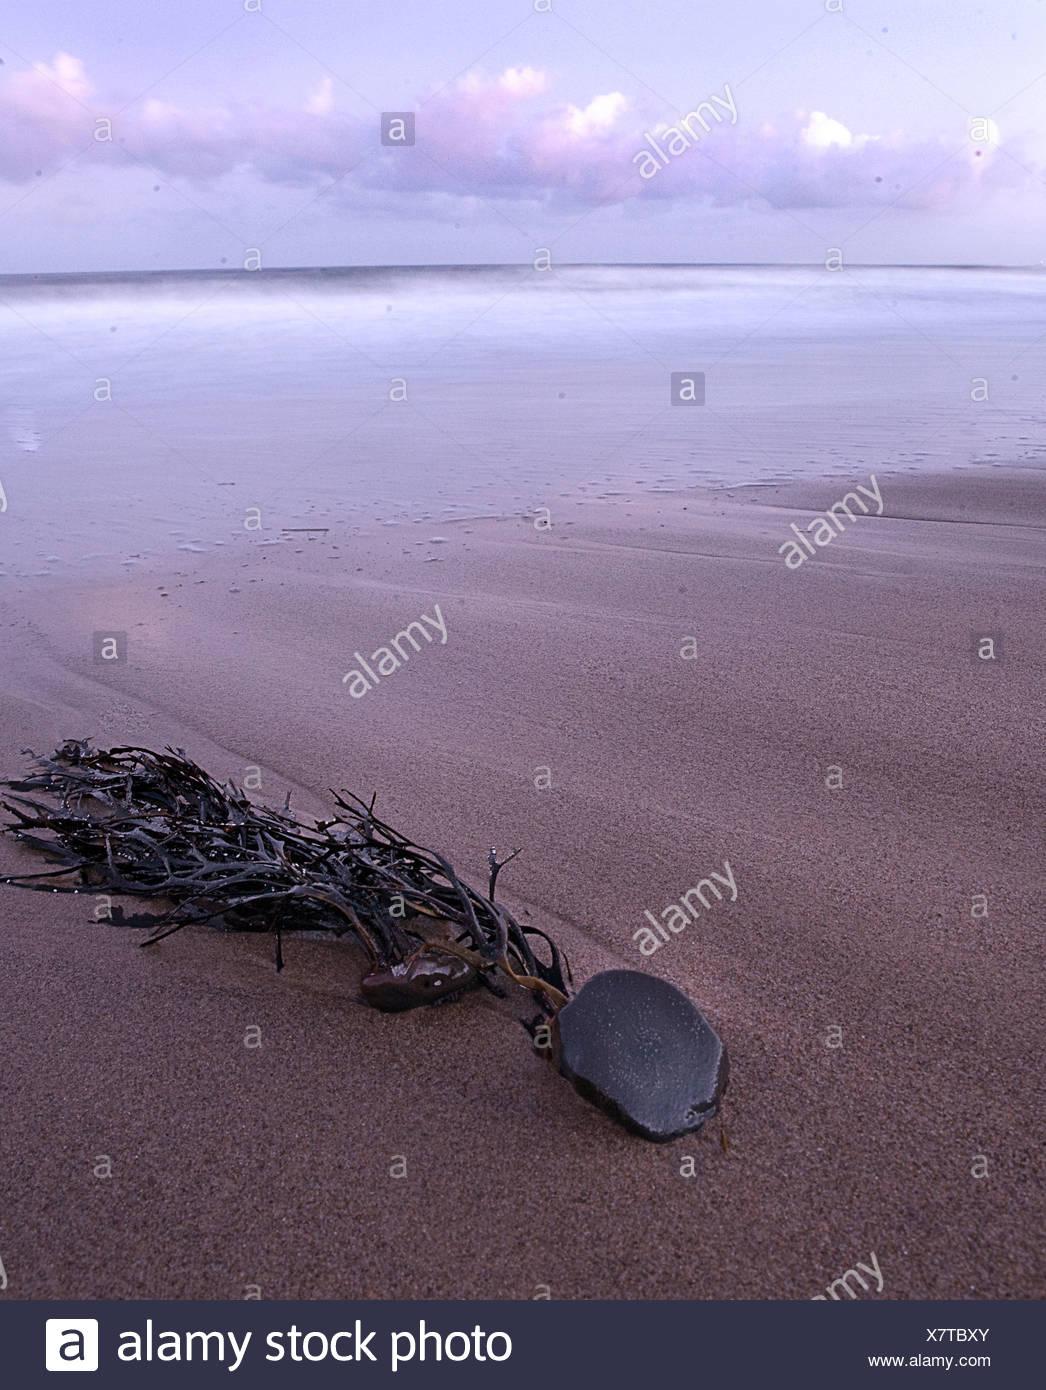 Seaweed lying on a deserted beach - Stock Image